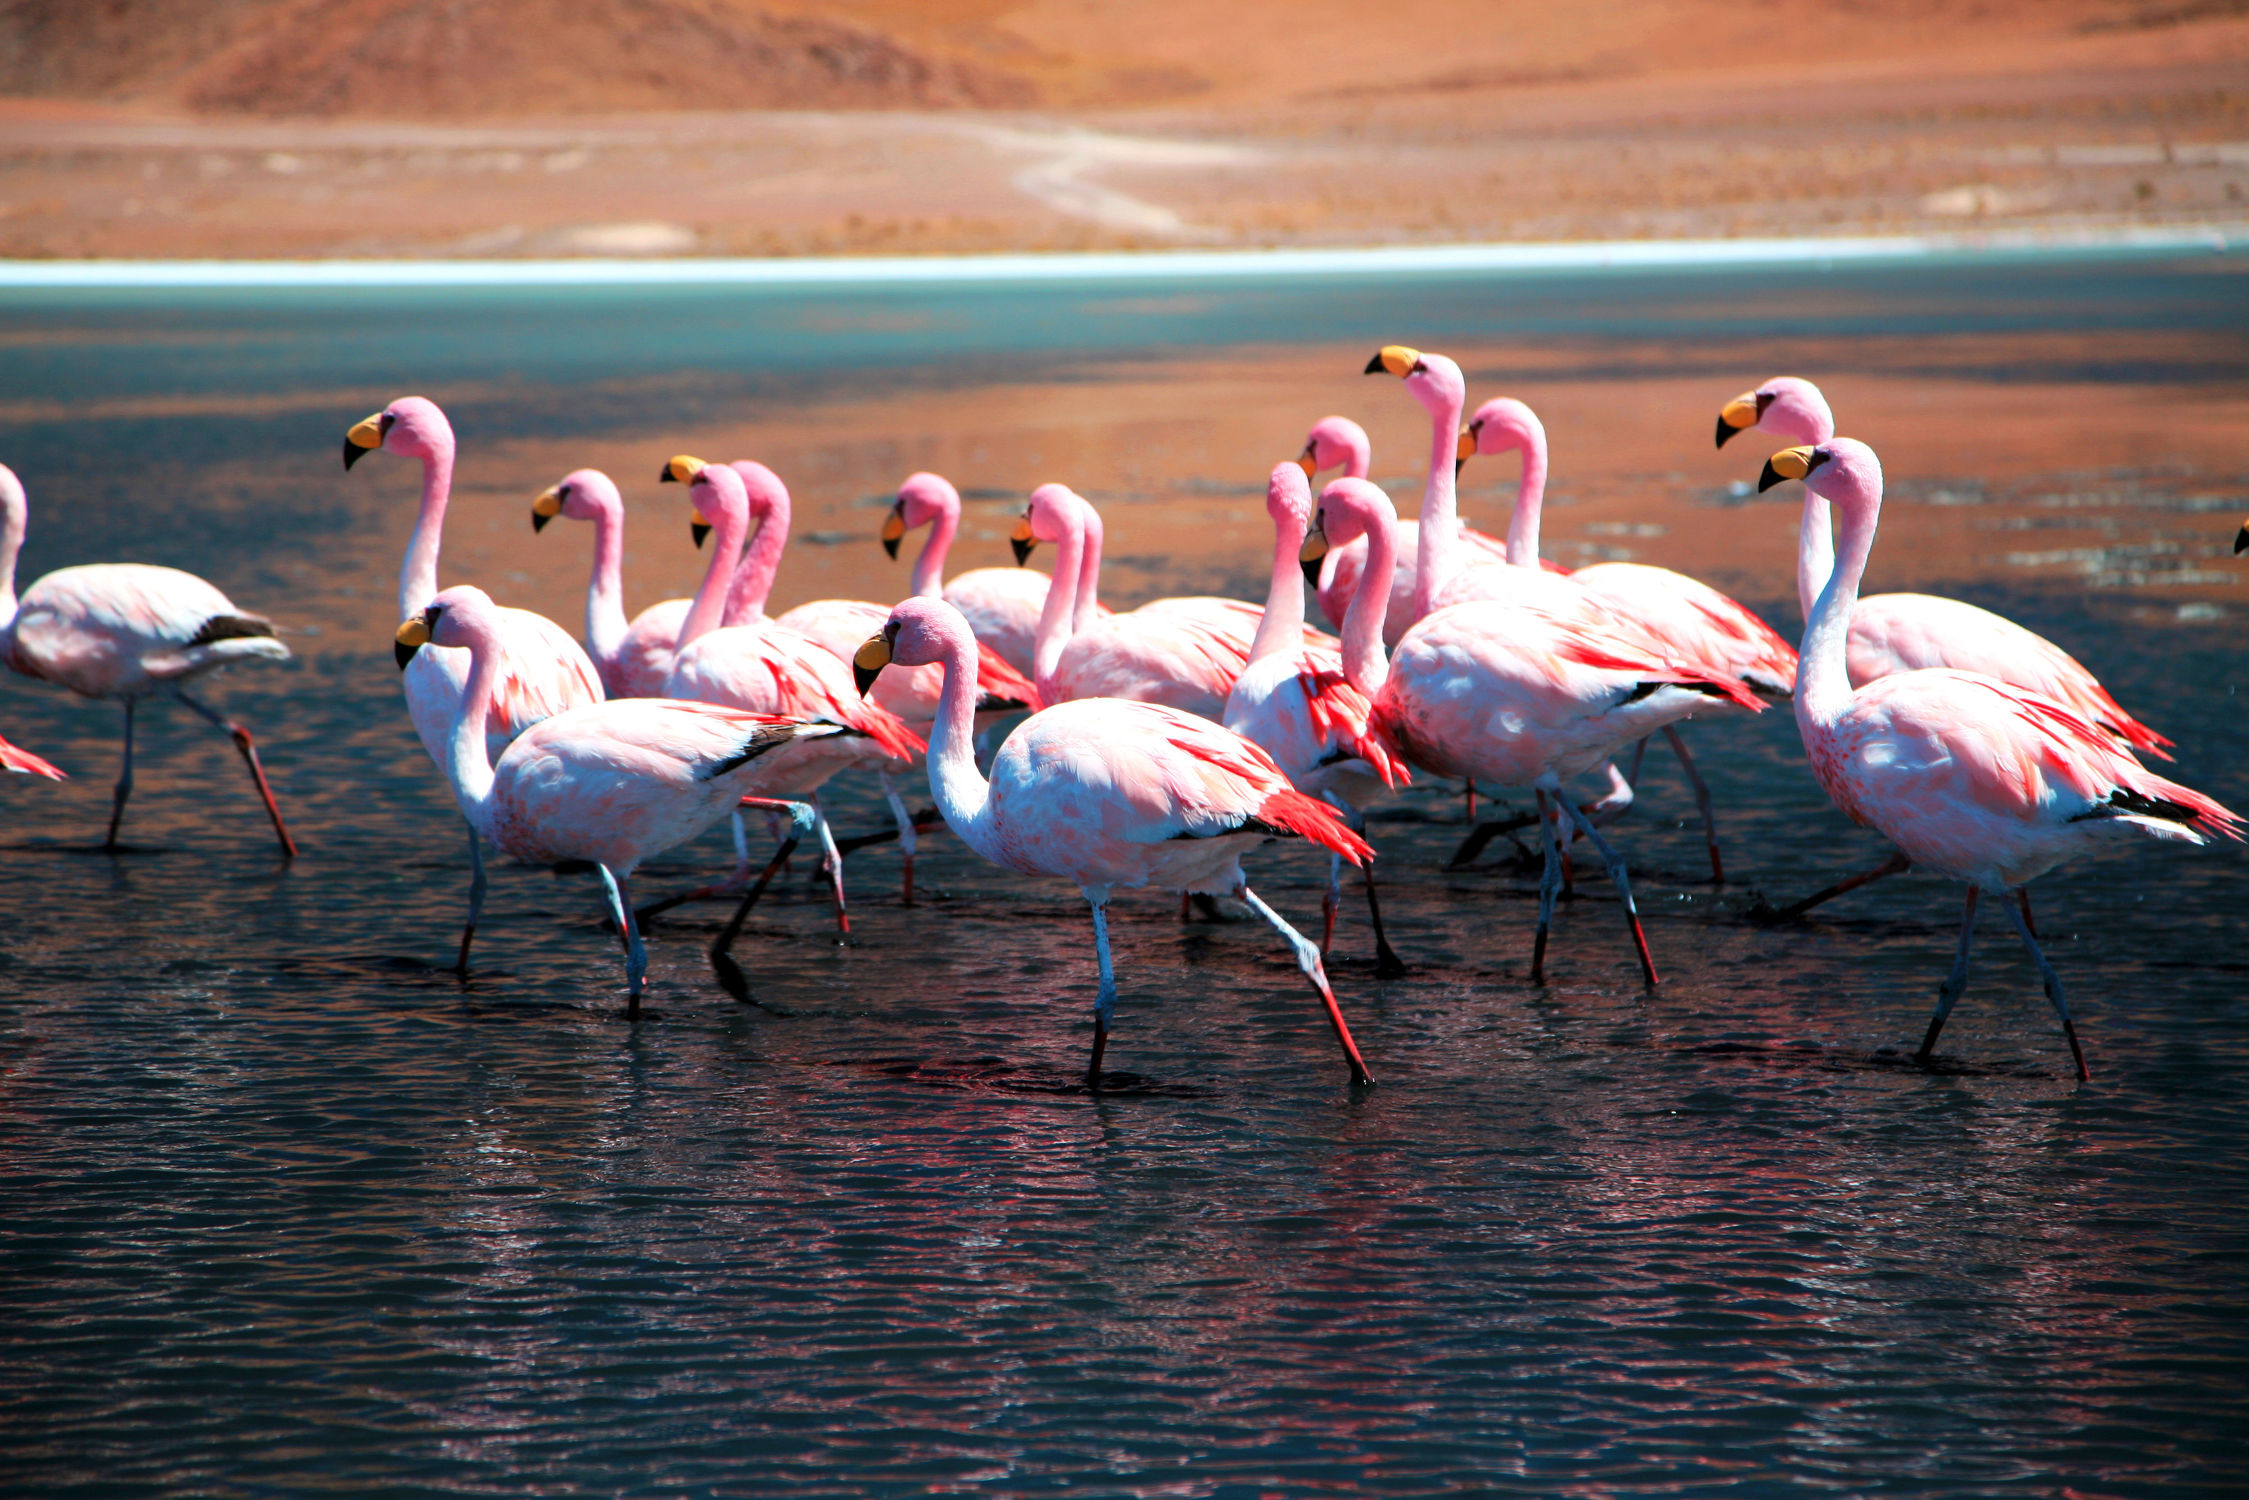 Bild mit Tiere, Natur, Tier, Tierwelt, Wildnis, Flamingo, Flamingos